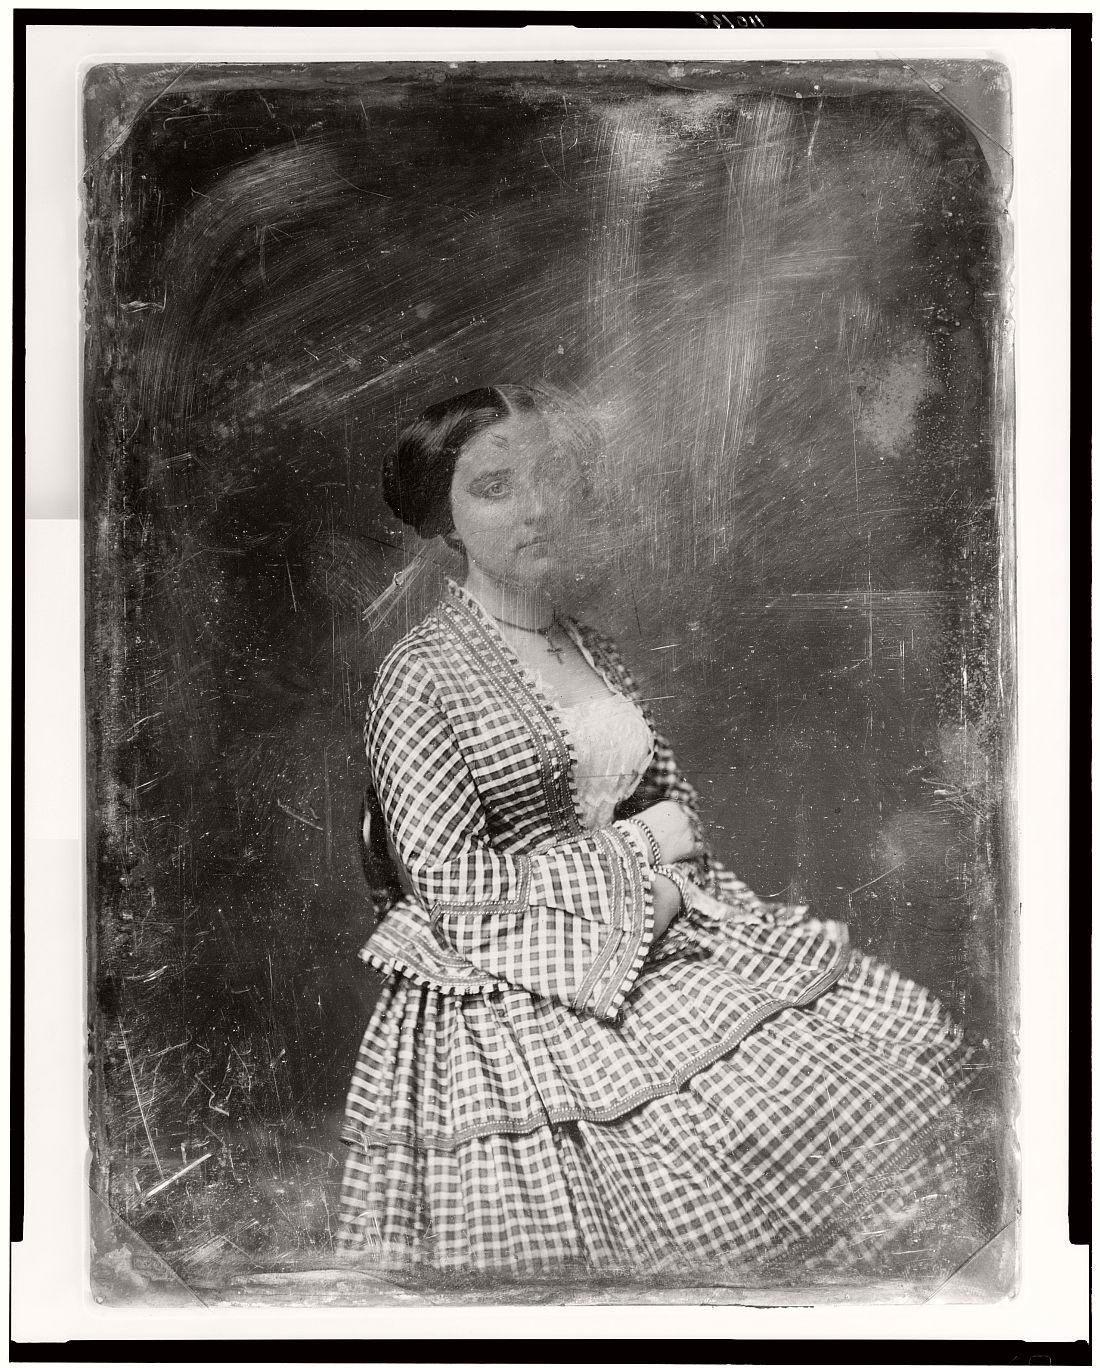 vintage-daguerreotype-portraits-from-xix-century-1844-1860-61